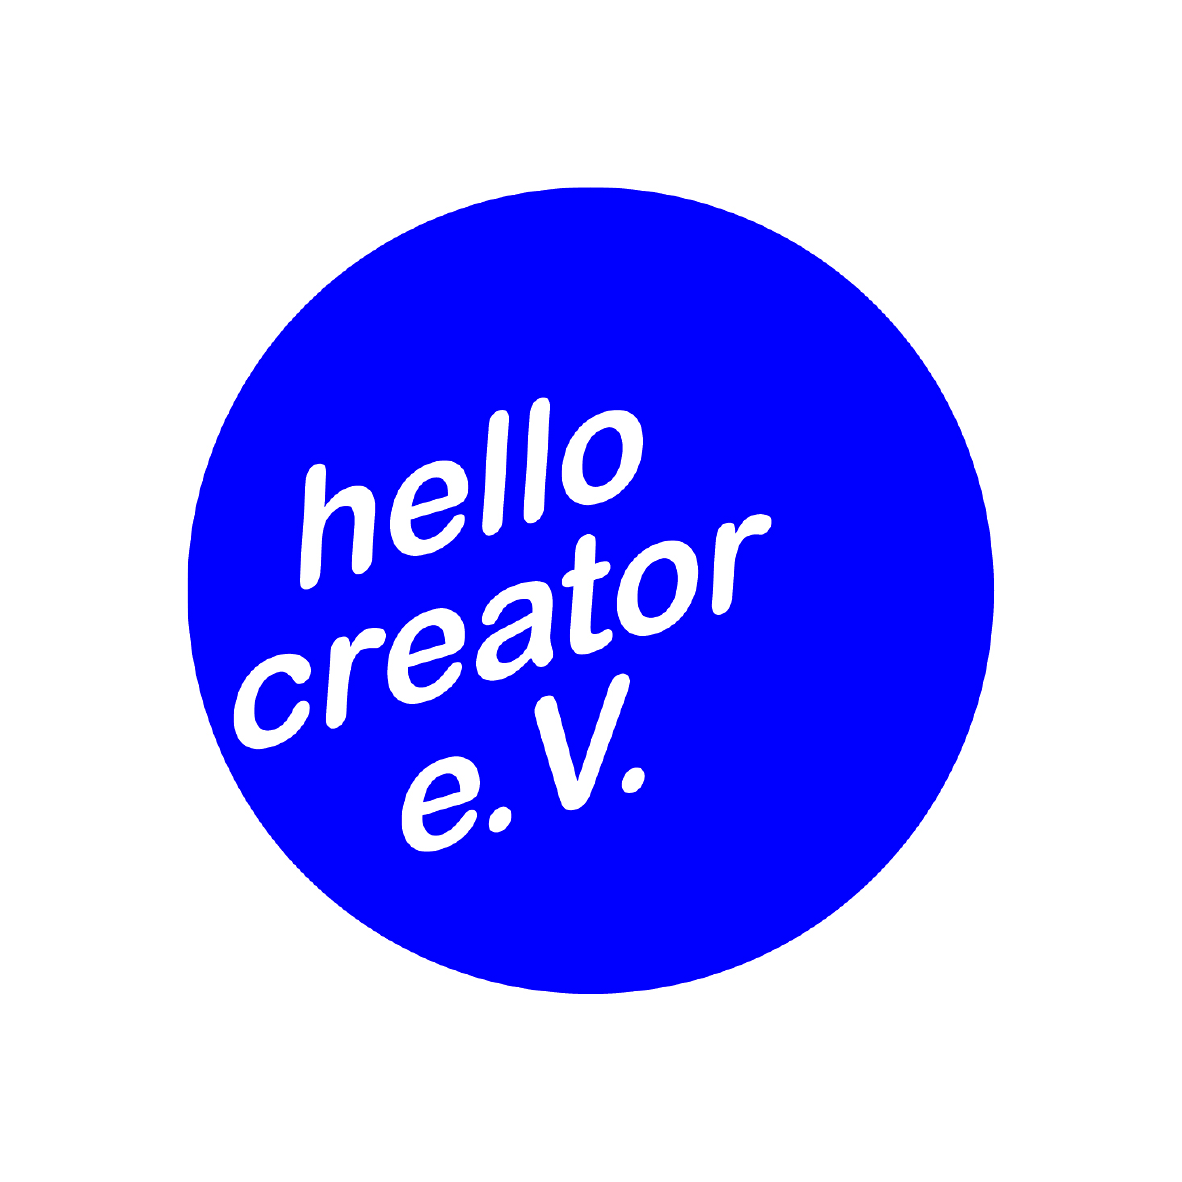 logo hello creator